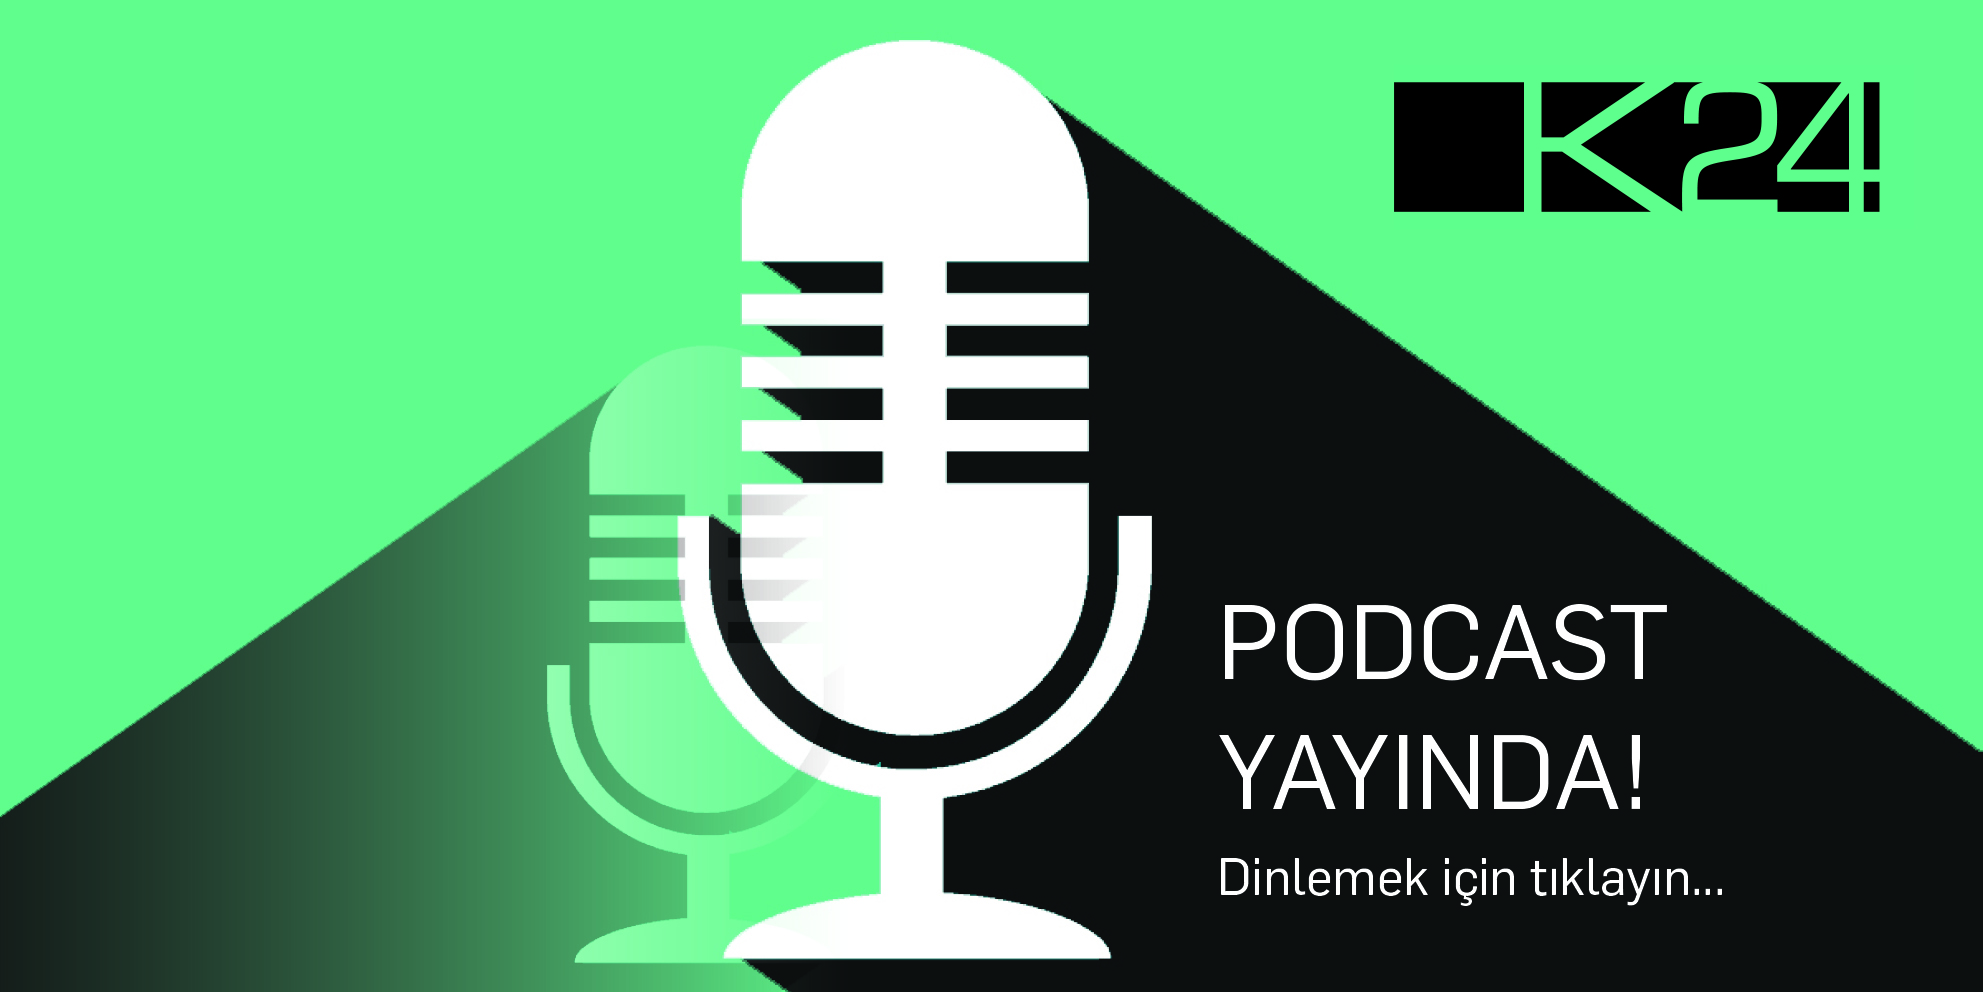 K24 Podcast